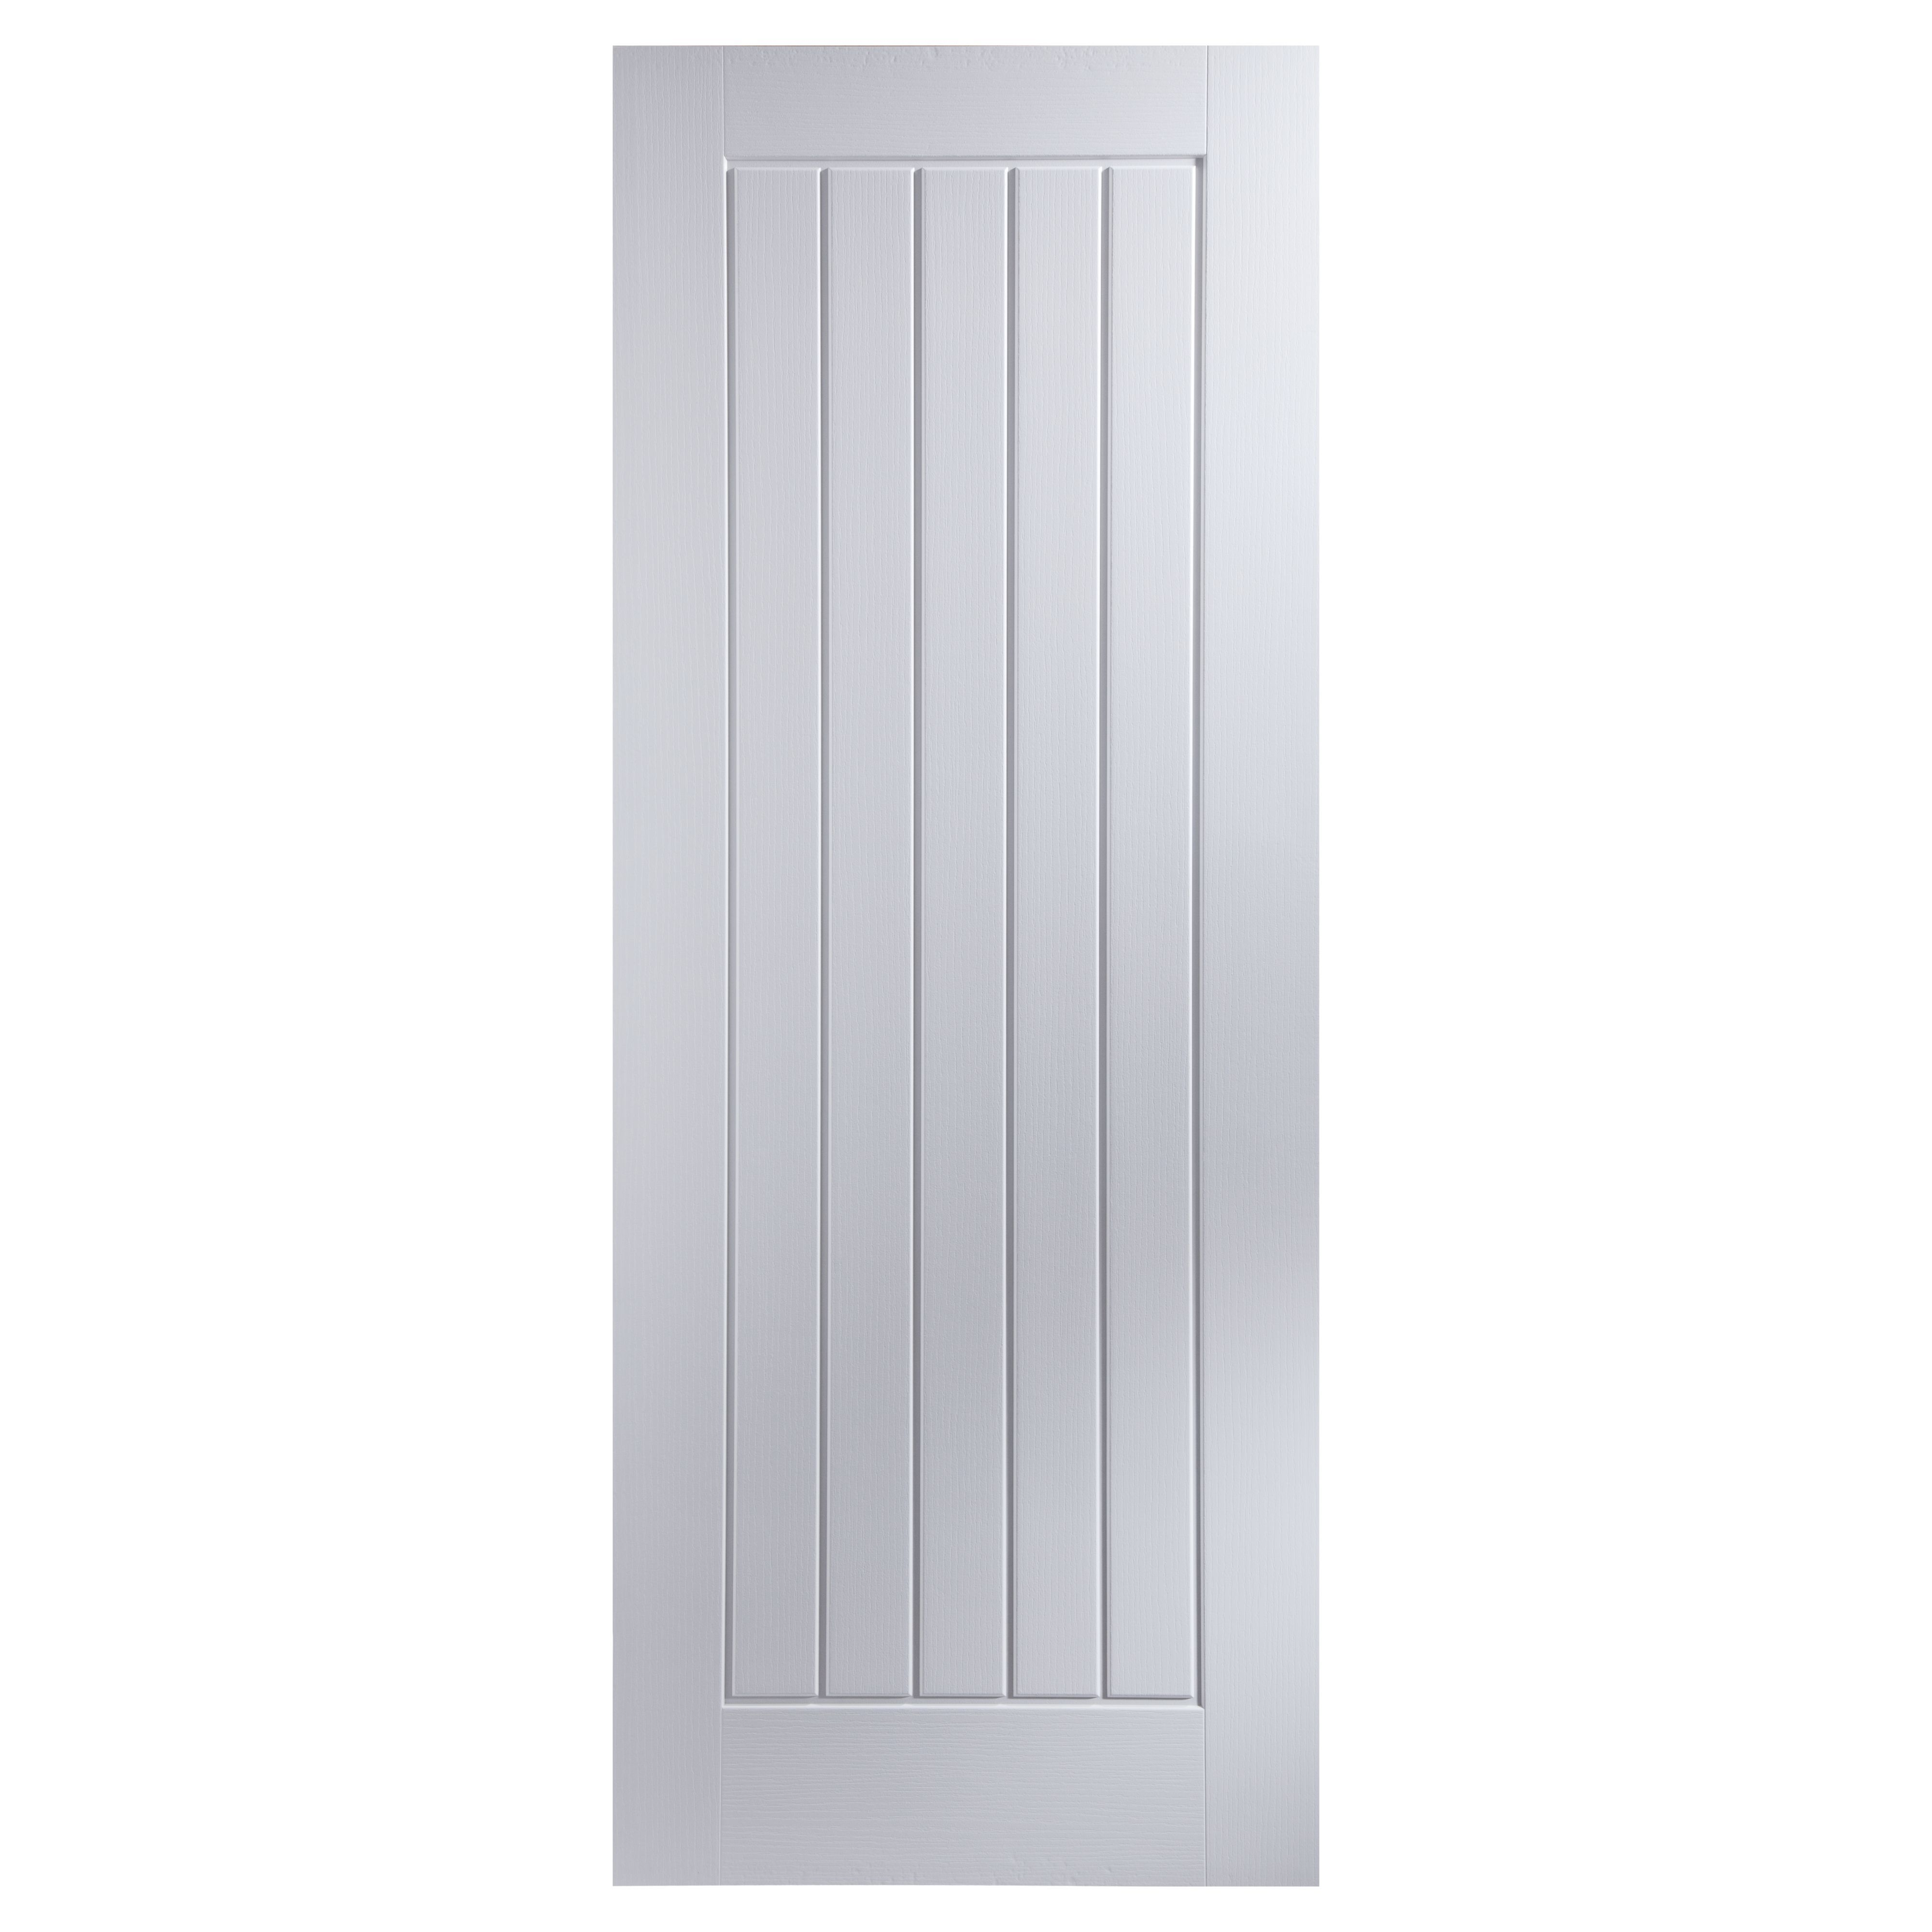 Cottage Panel Primed Woodgrain Unglazed Internal Fire Door H